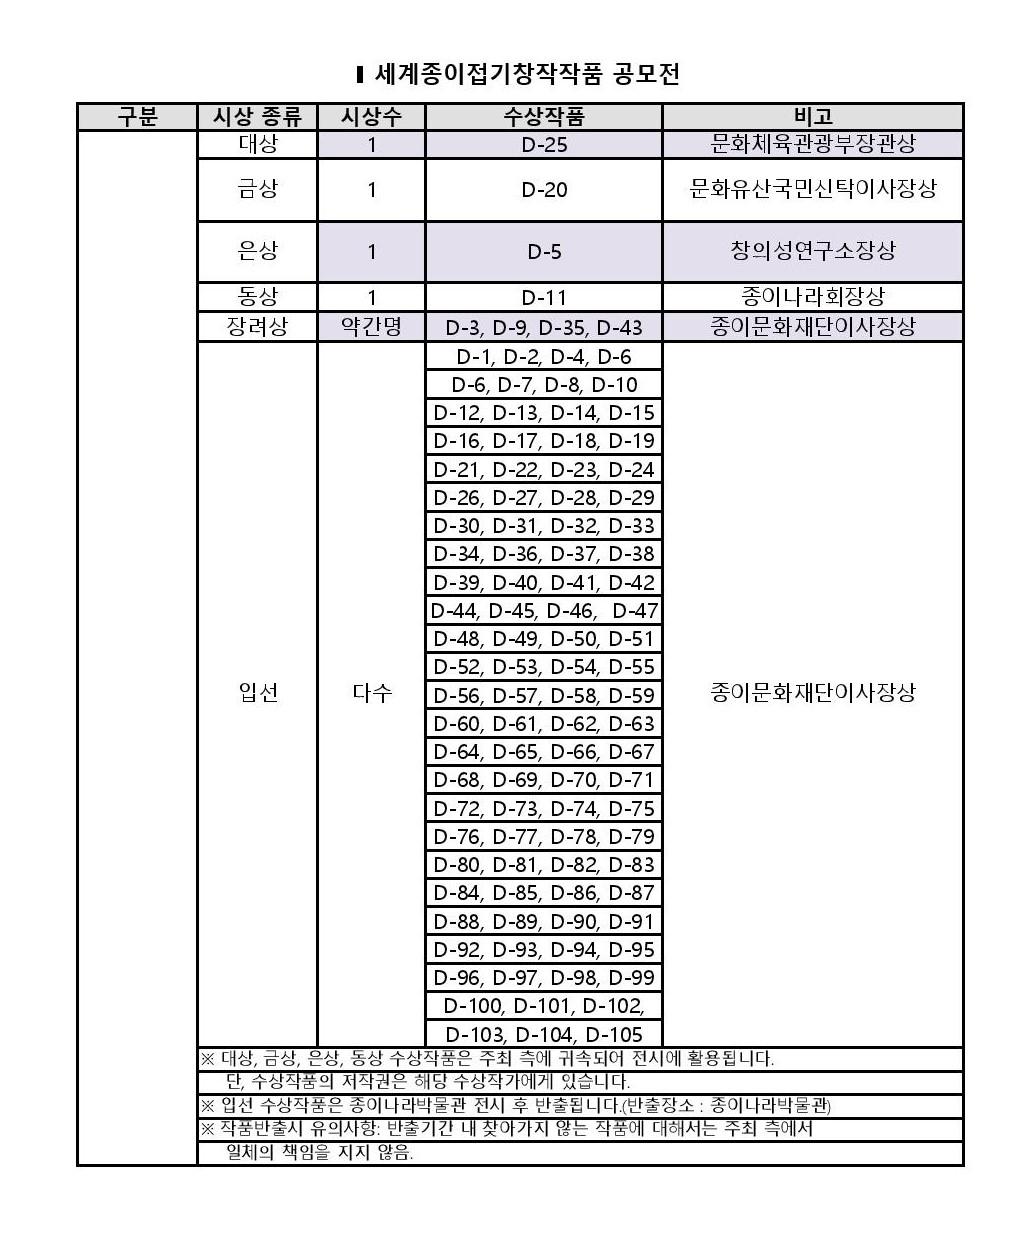 2073001650_b0f9f550_Document-page-001.jpg